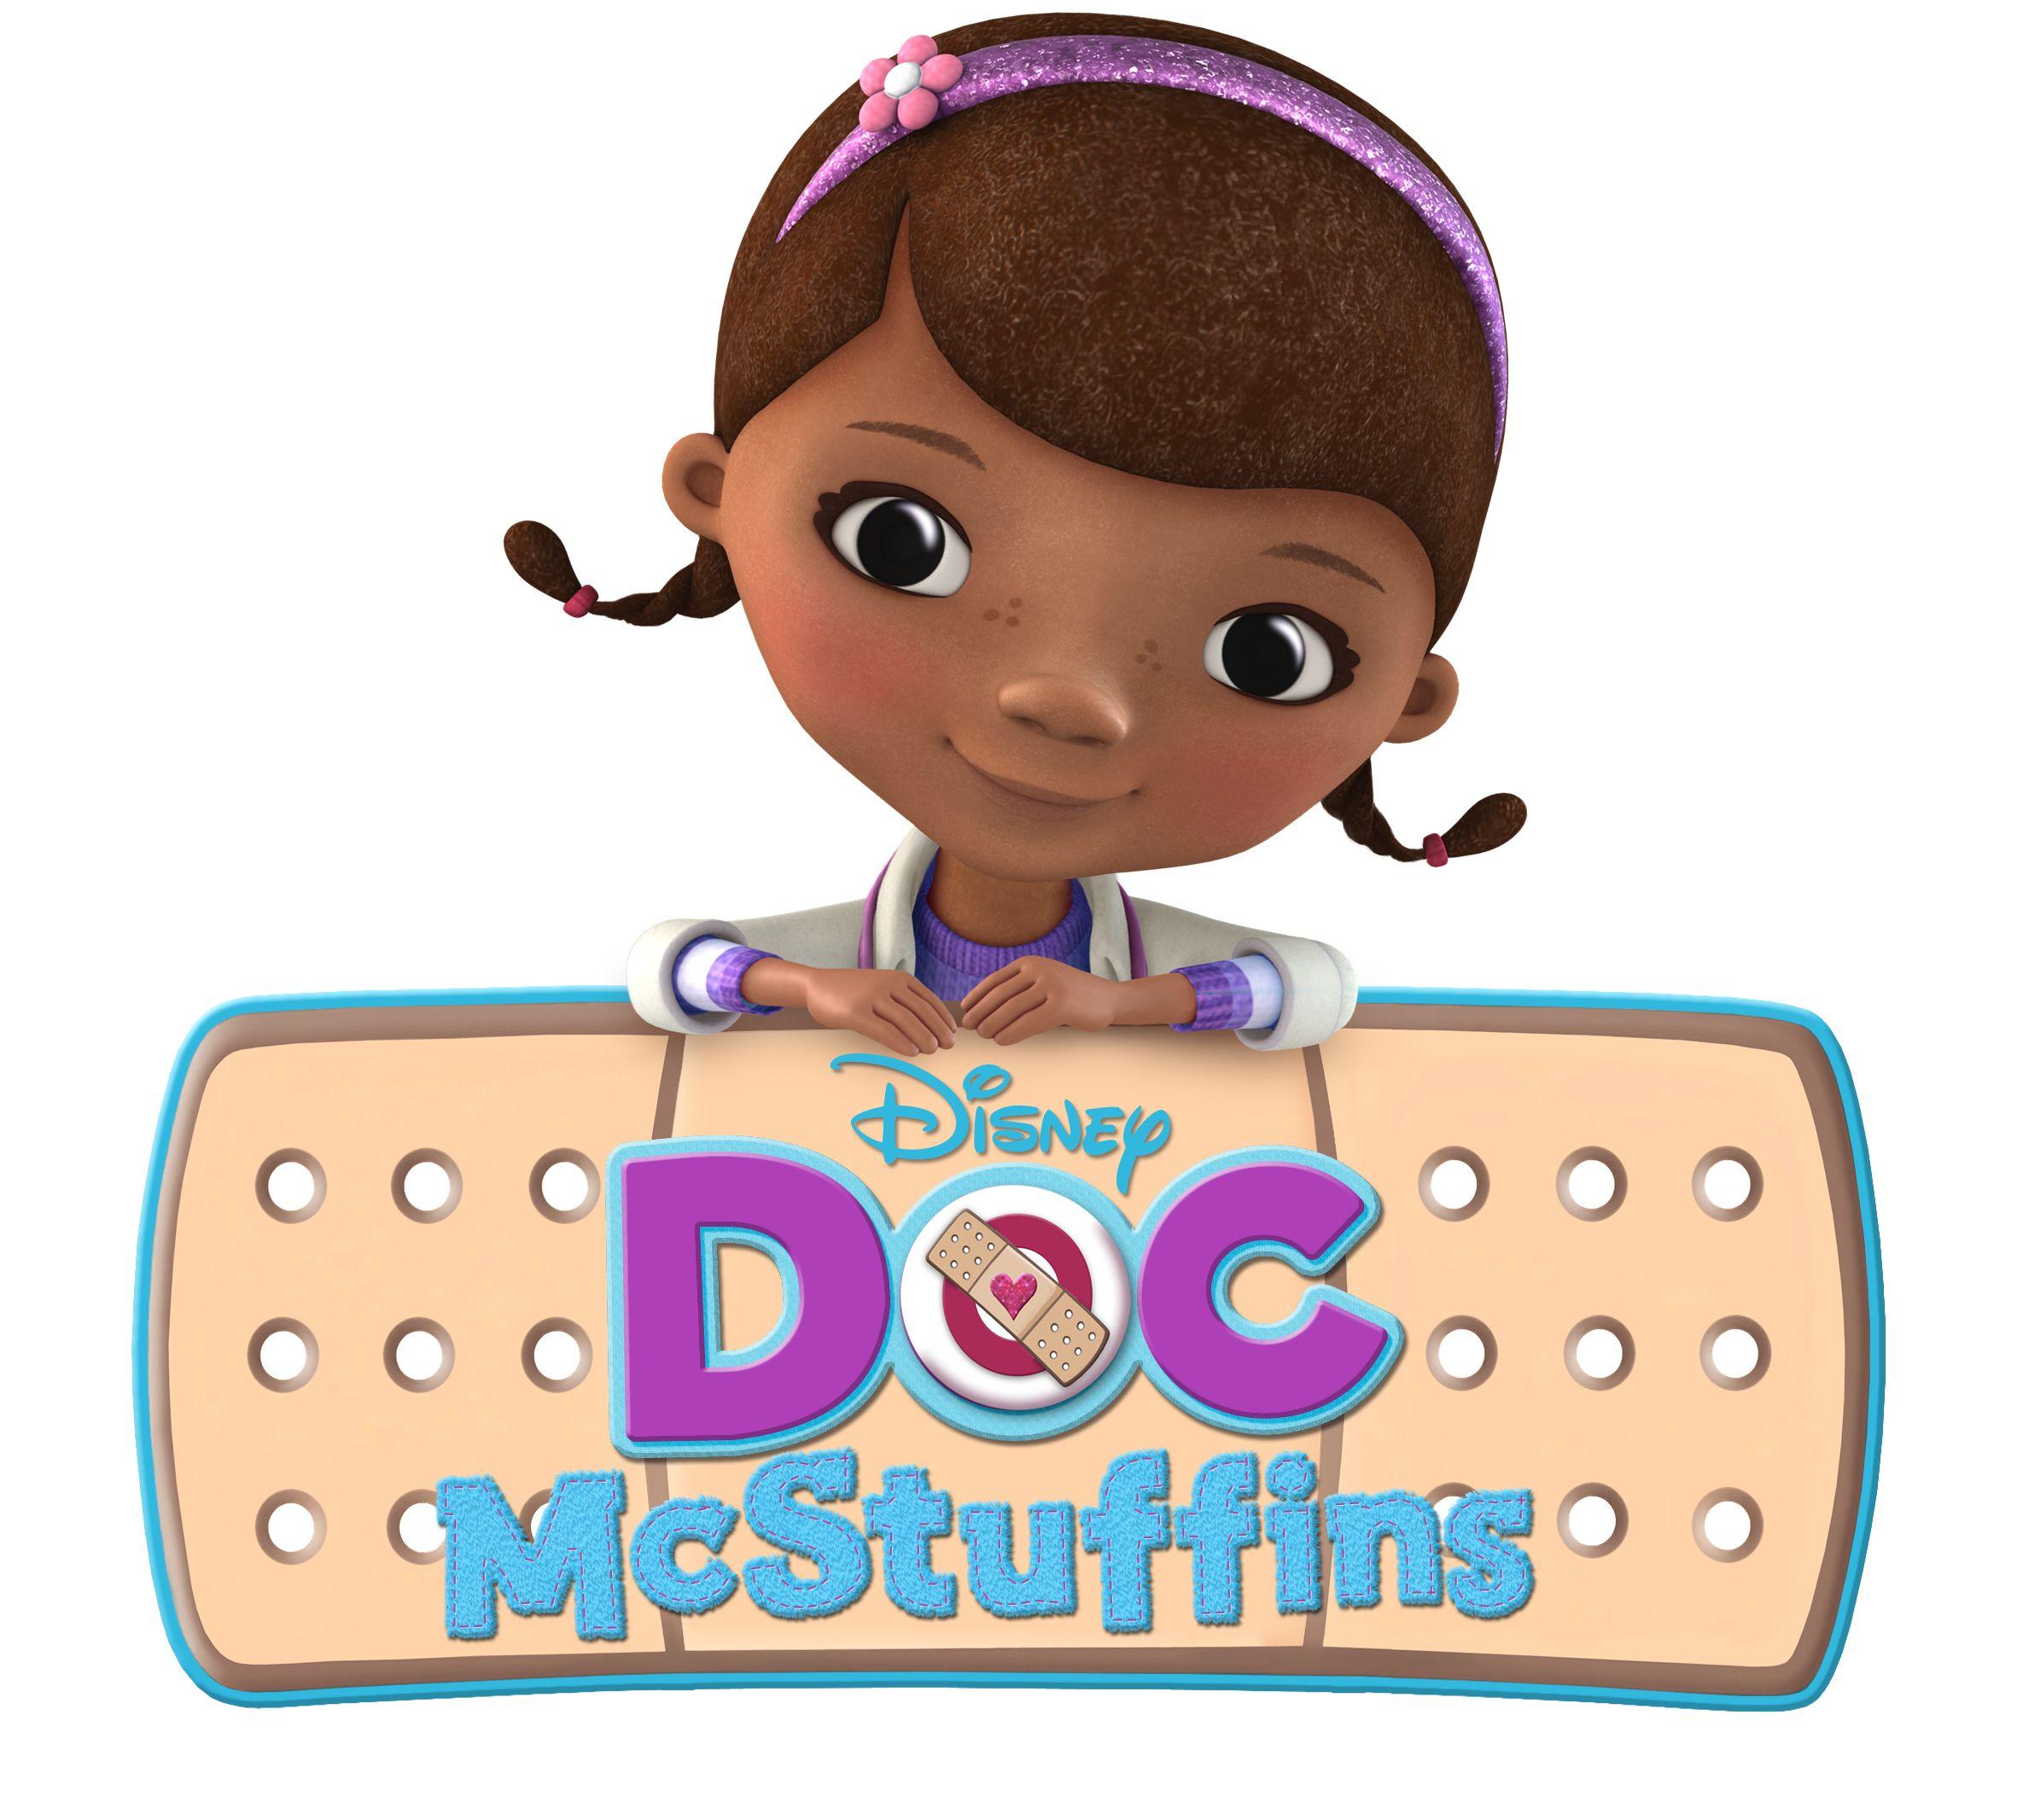 34179a83b0bfcbc52a125caf3b02f594 Jpg 2370 2132 Doc Mcstuffins Birthday Party Doc Mcstuffins Party Doc Mcstuffins Toys